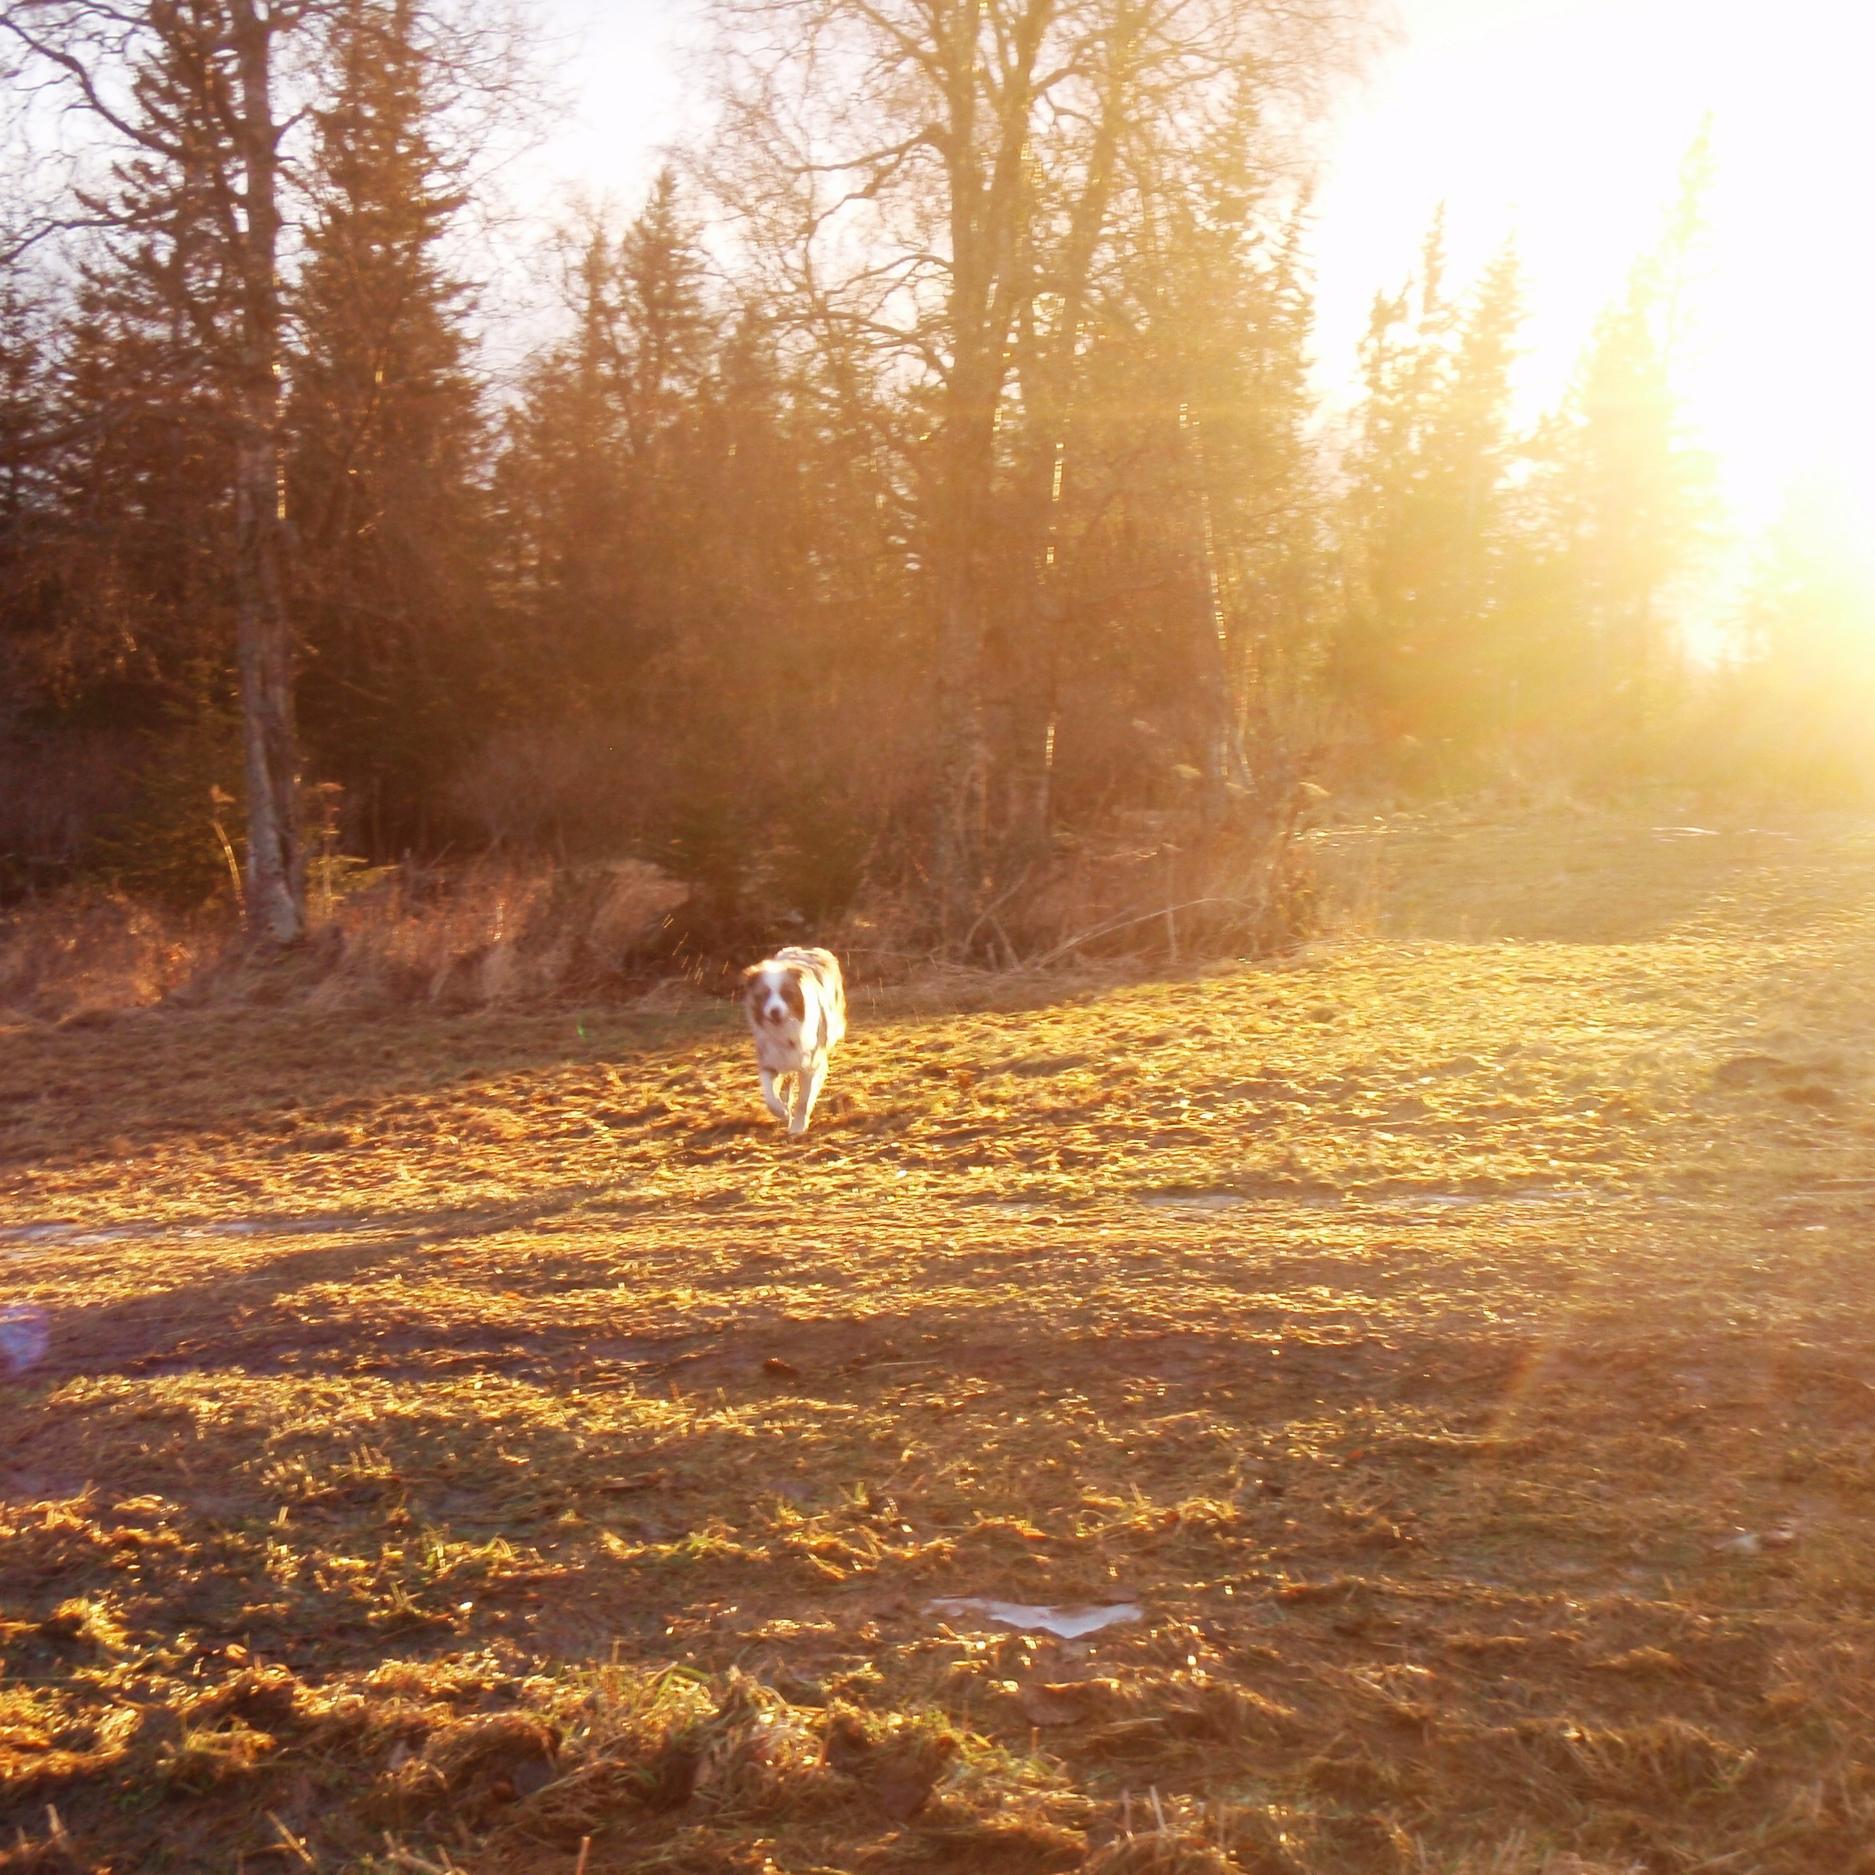 Australian Shepherd in the sunset in Alaska